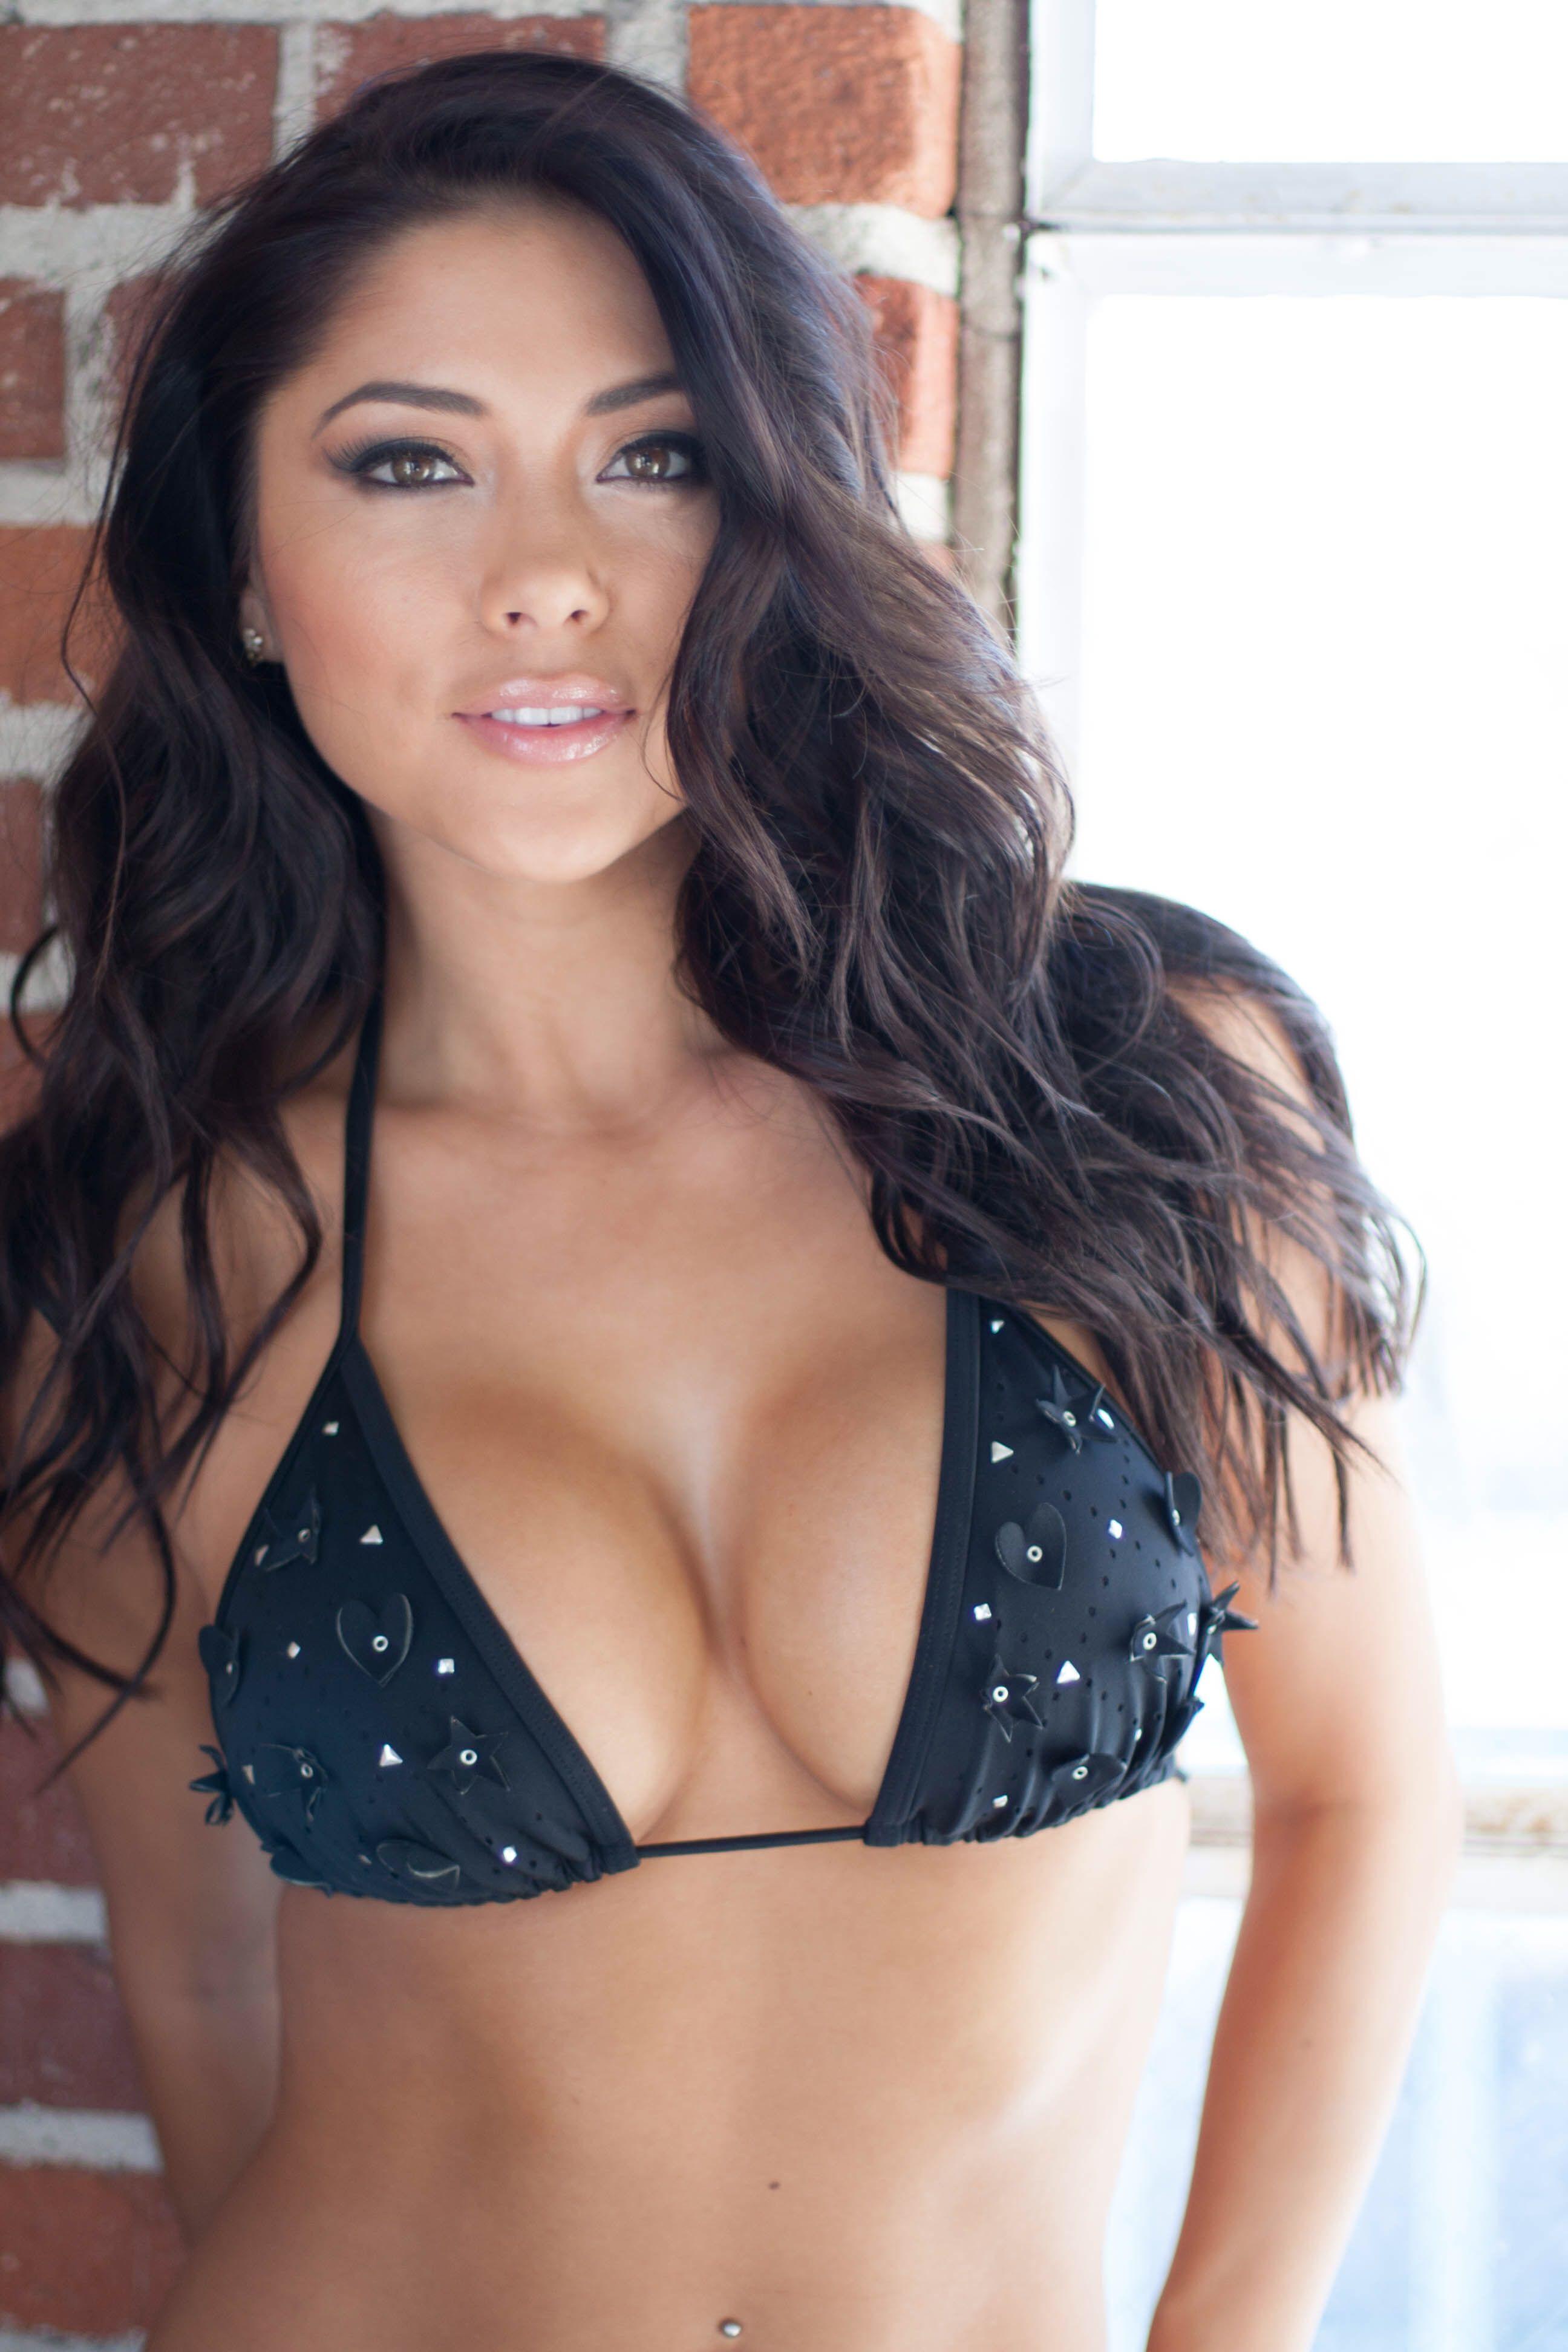 Bikini Ali Michael nudes (77 photos), Tits, Cleavage, Twitter, lingerie 2019